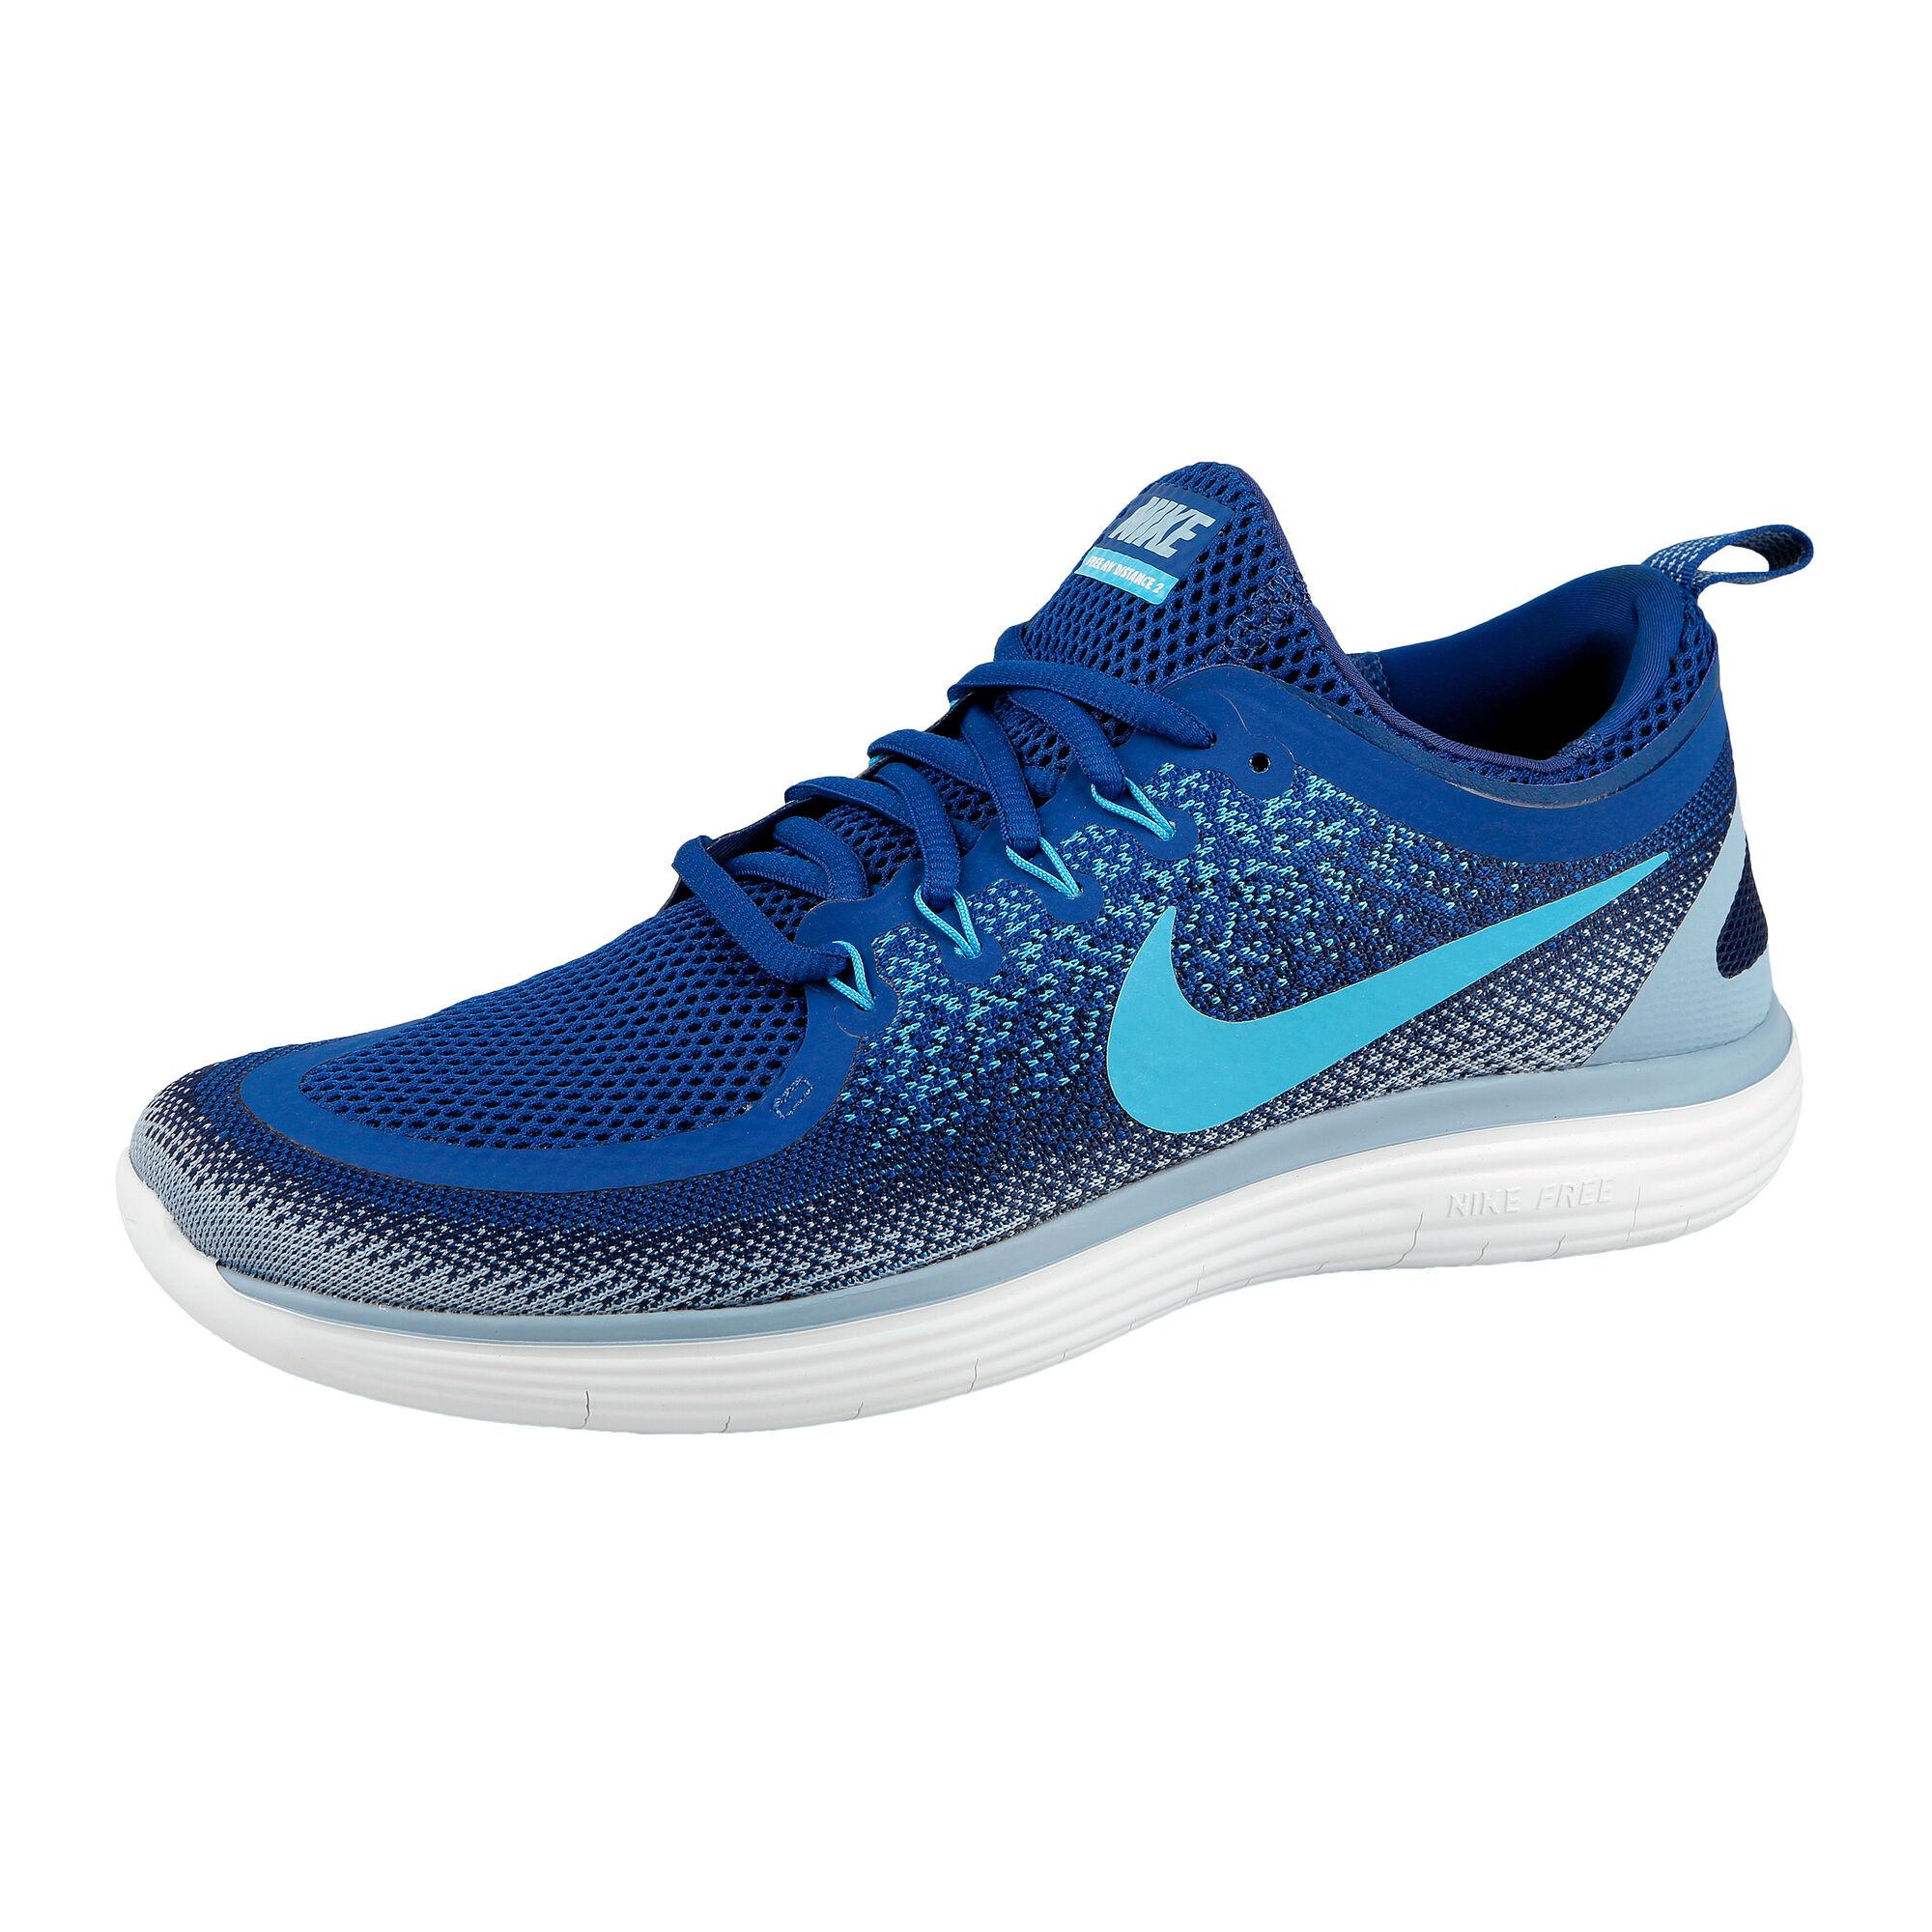 reputable site 571a0 bfdf6 Nike Free Run Distance 2 Natural Running Shoe Men - Blue, Light Blue